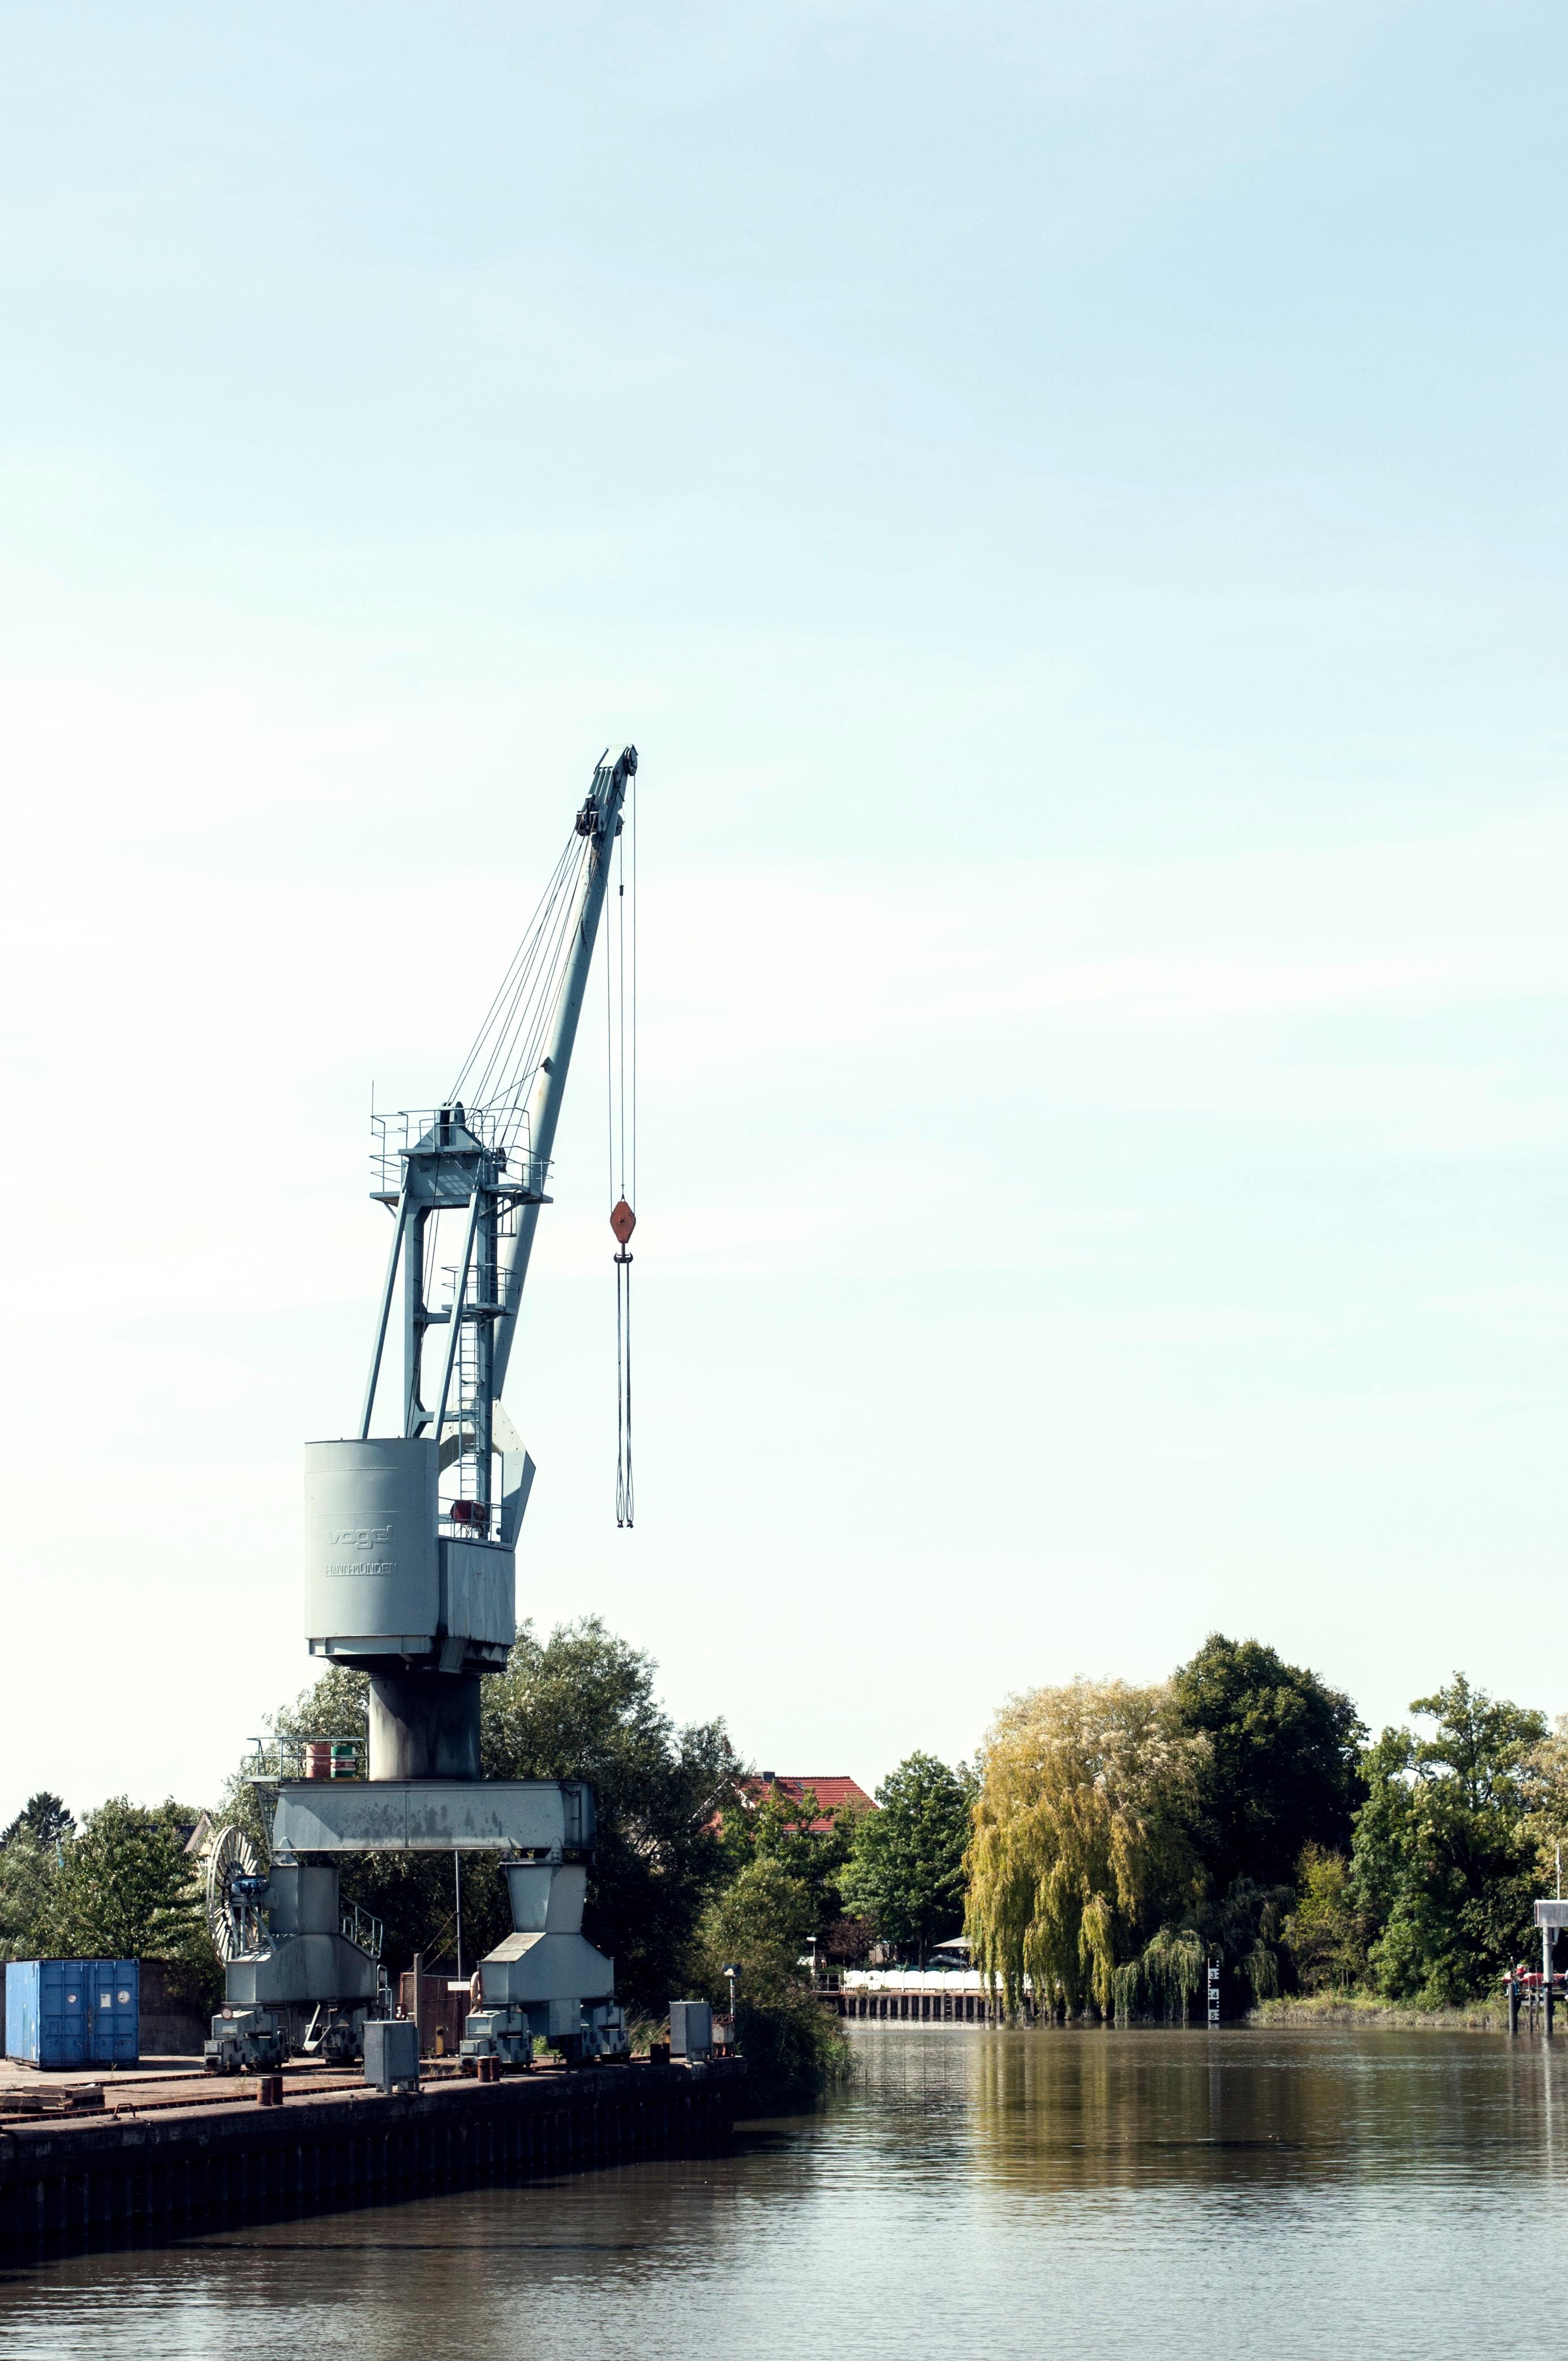 Kran Fährfahrt Elbe